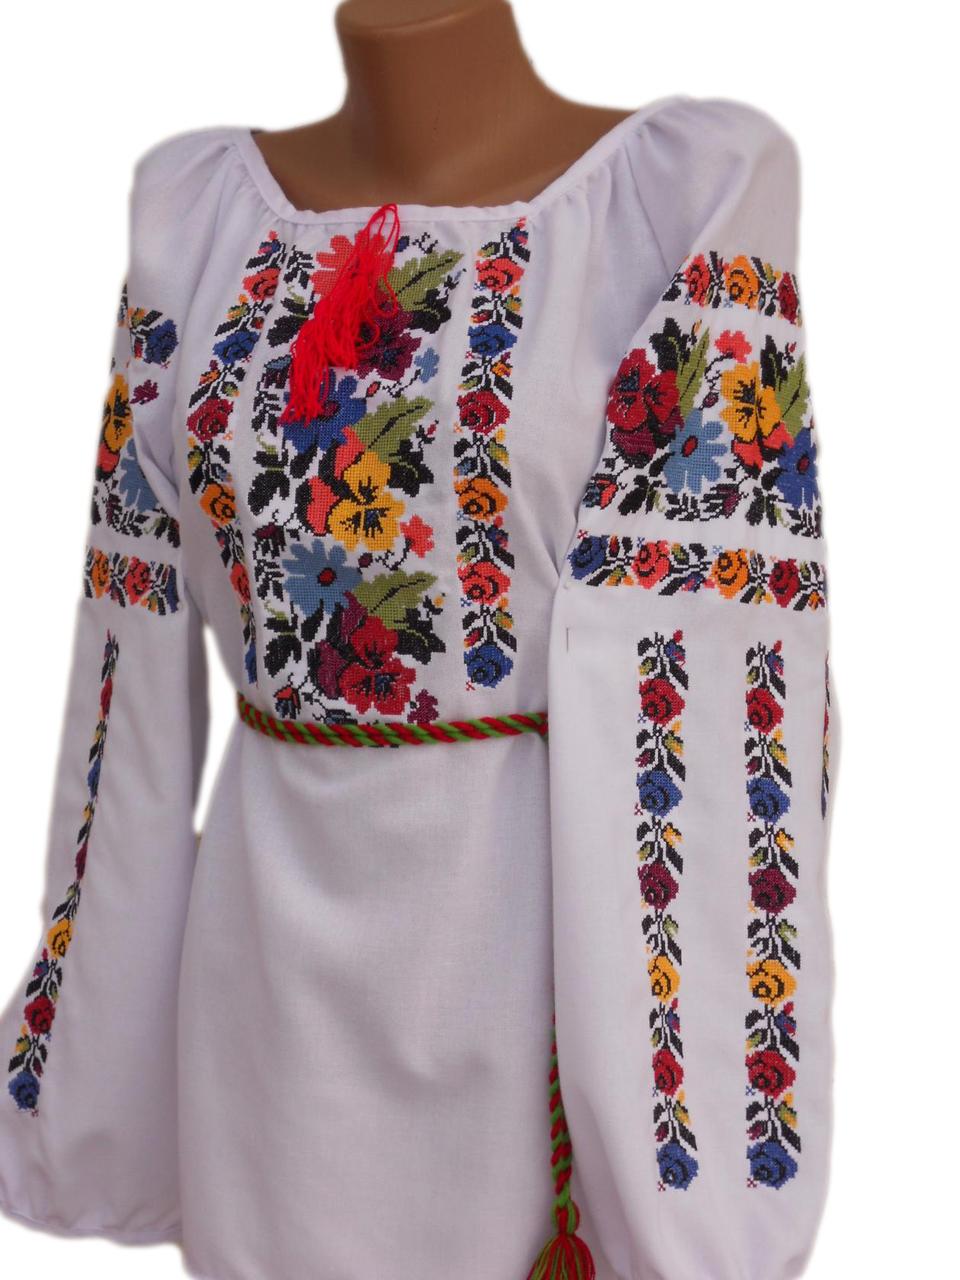 "Жіноча вишита сорочка (блузка) ""Кассі"" (Женская вышитая рубашка (блузка) ""Касси"") BN-0033"